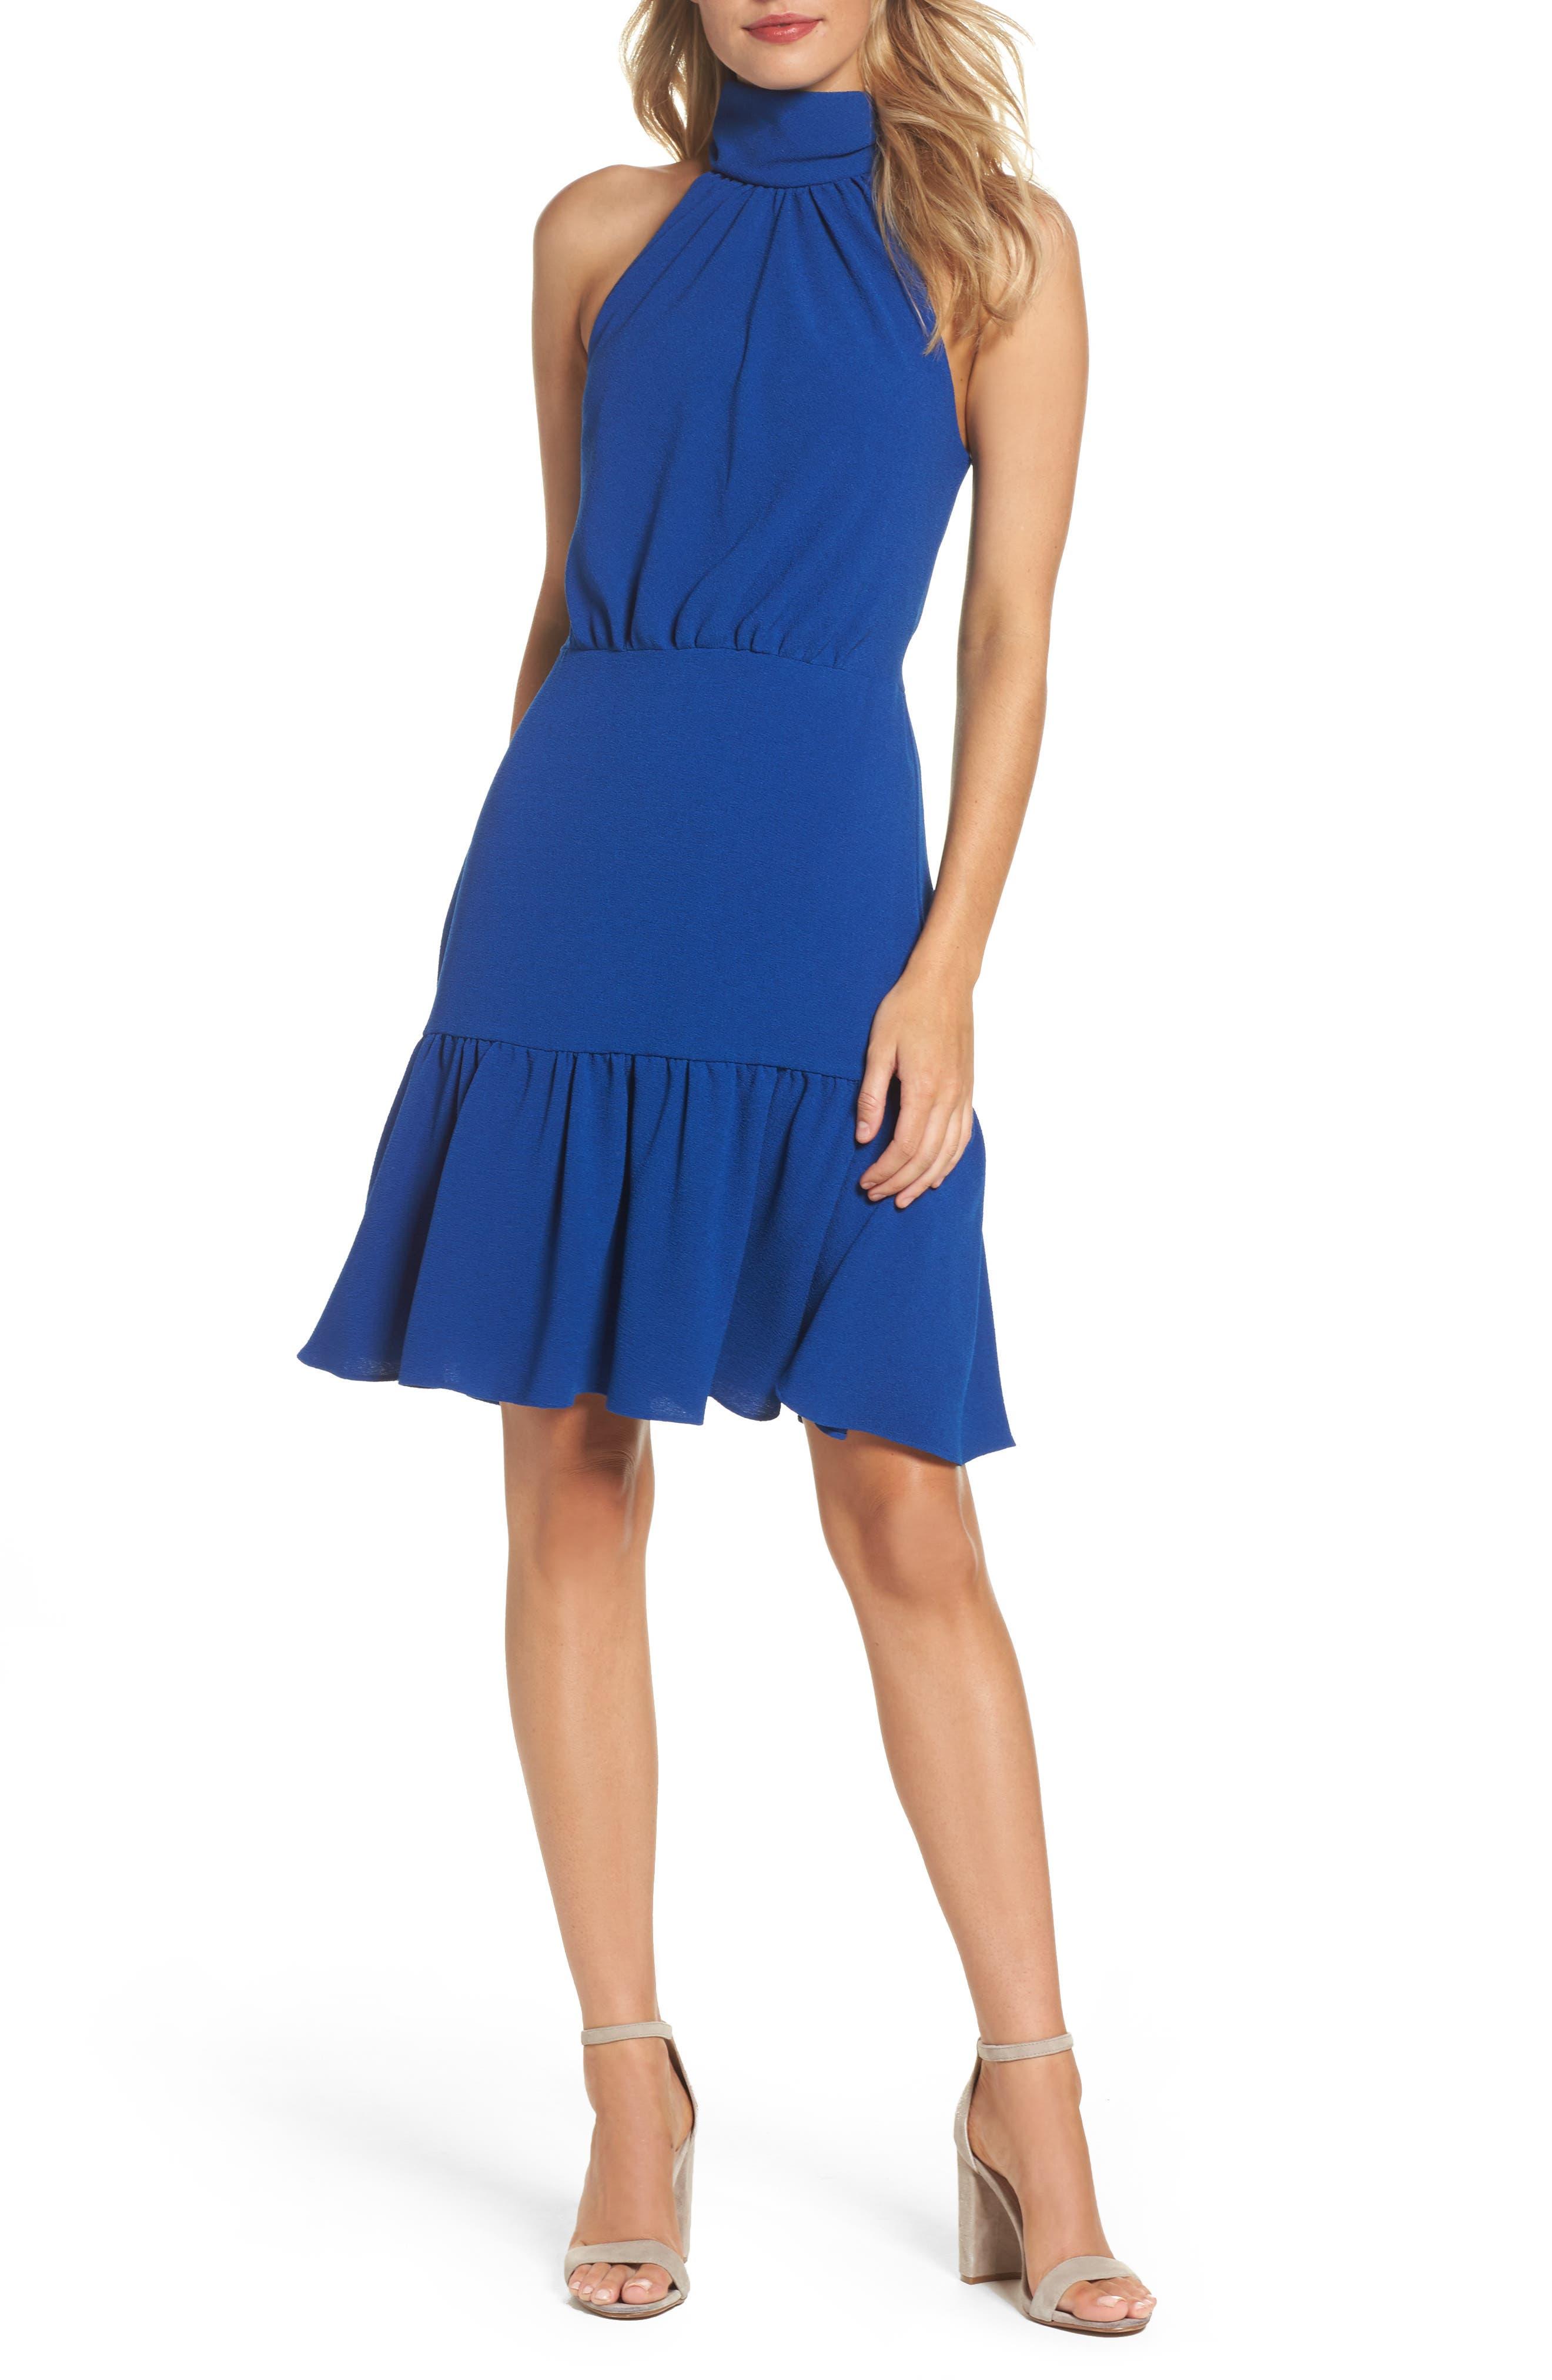 Main Image - Betsey Johnson Stretch Crepe Blouson Halter Dress